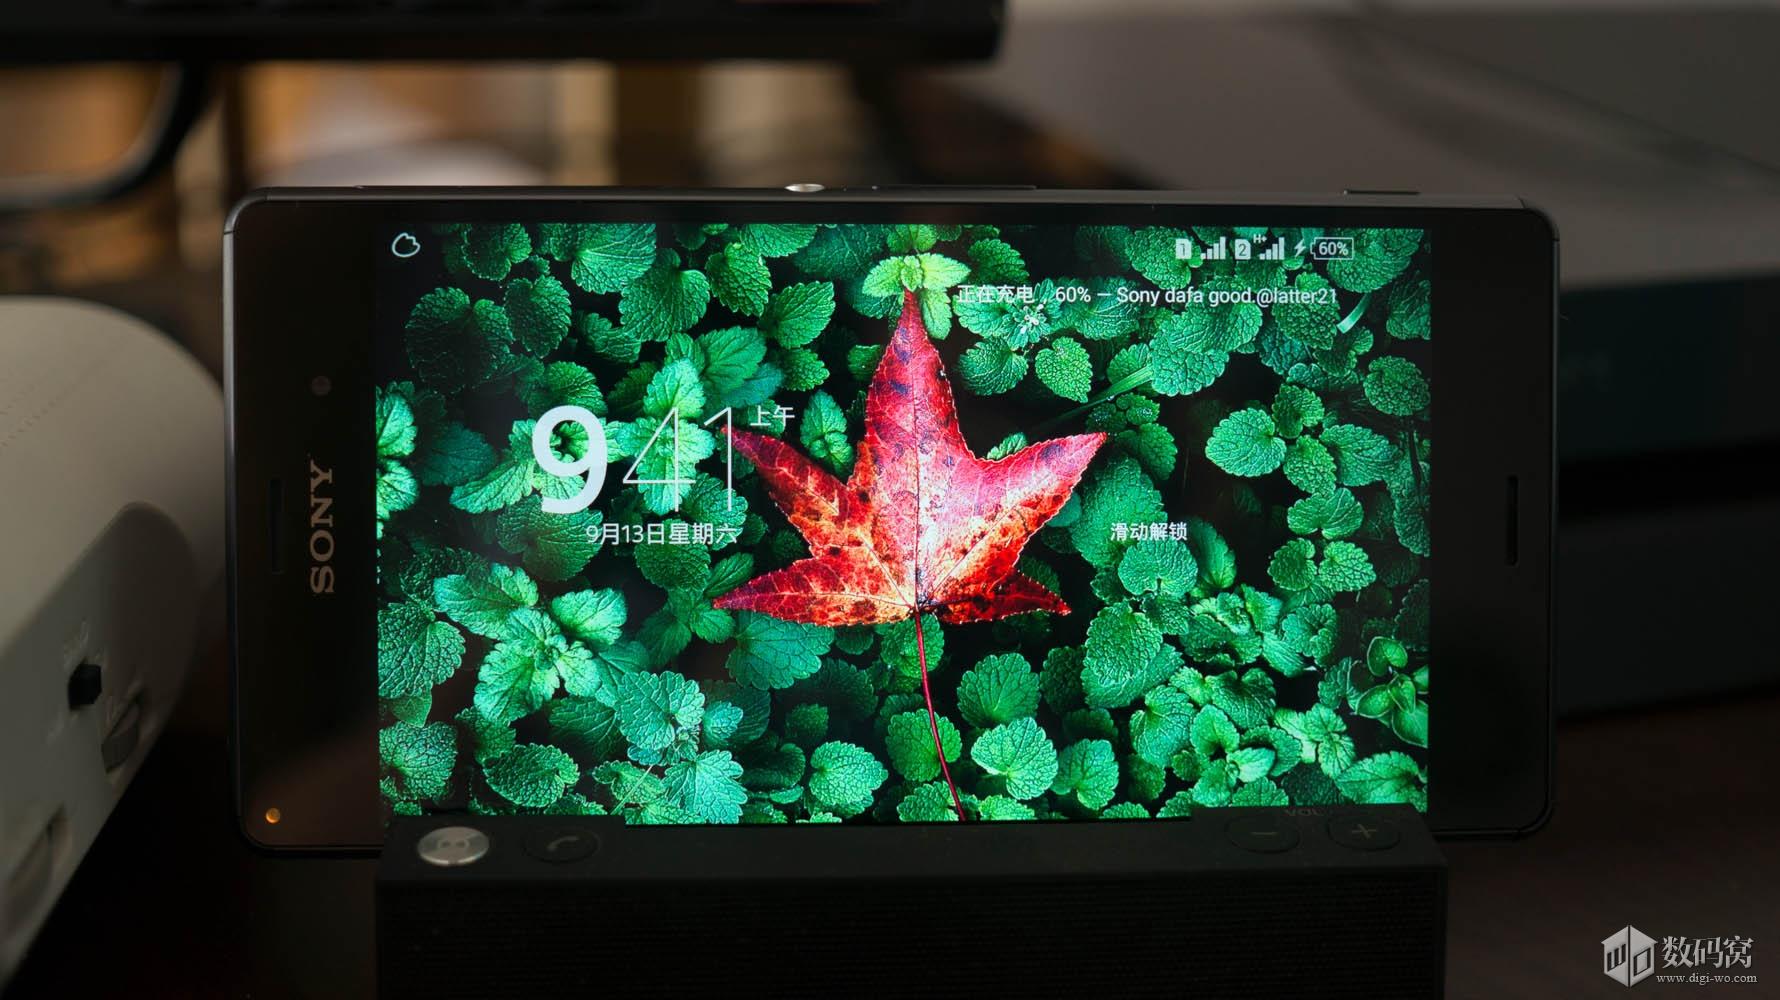 Xperia Z3 Dual Screen display